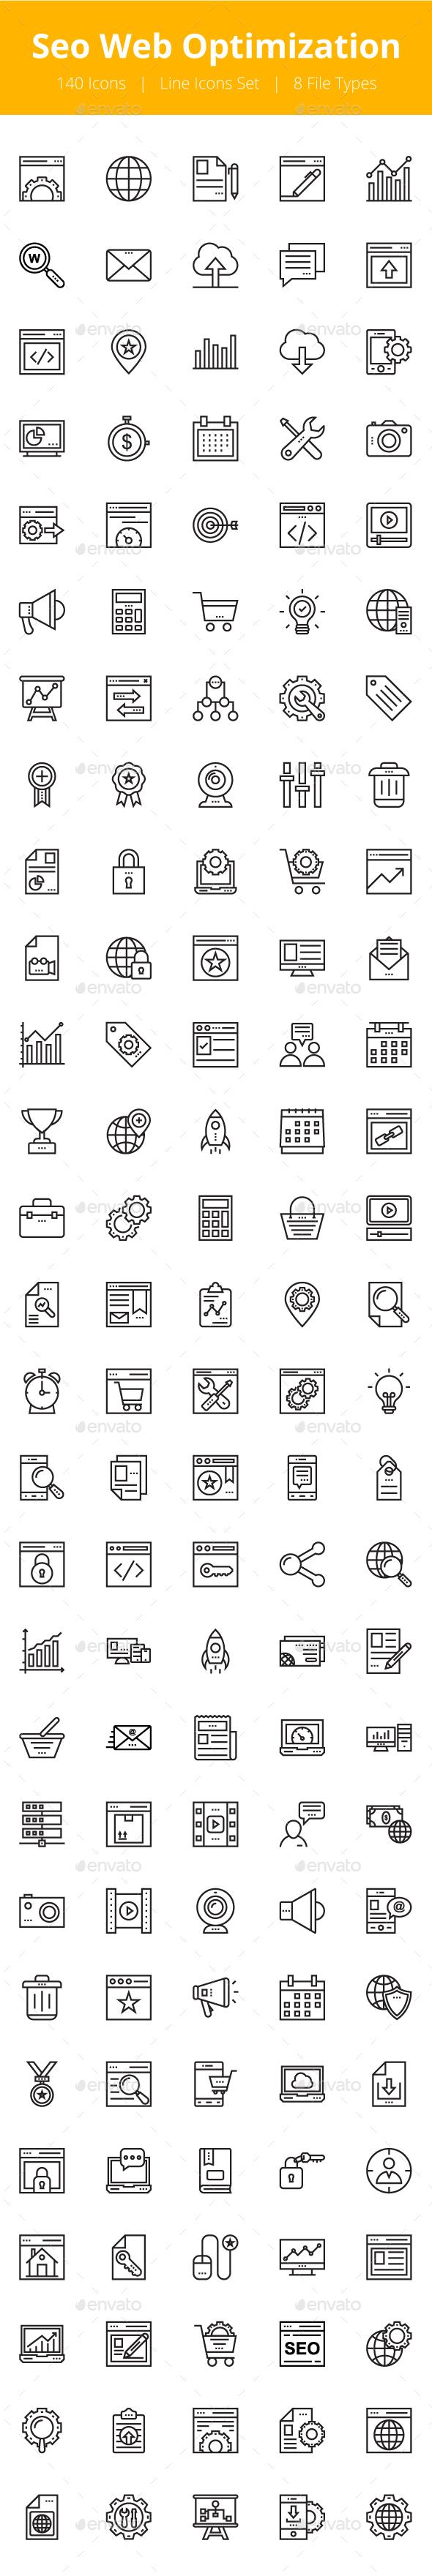 125+ Seo Web Optimization Line Icons - Icons